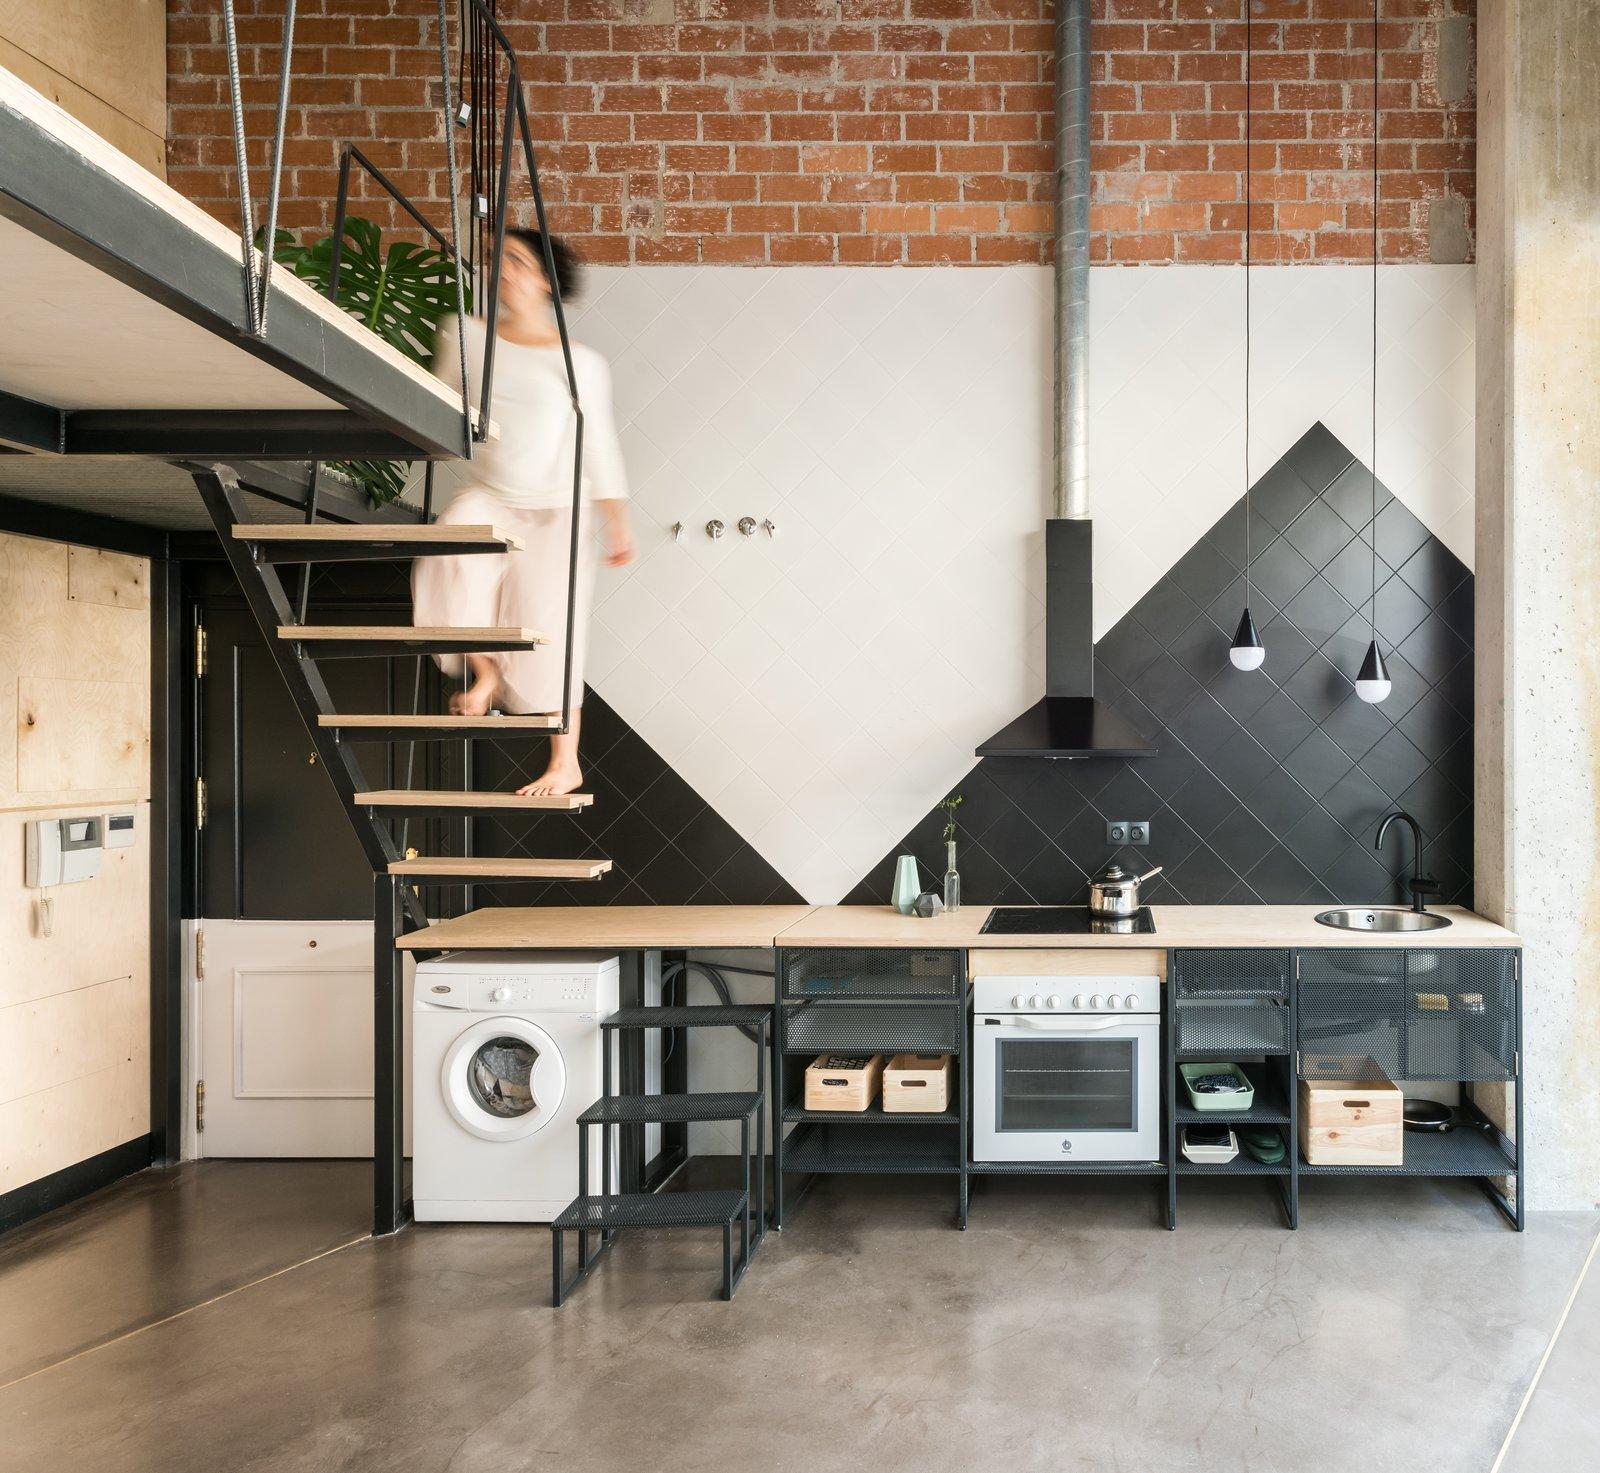 Up House CumuloLimbo Studio kitchen